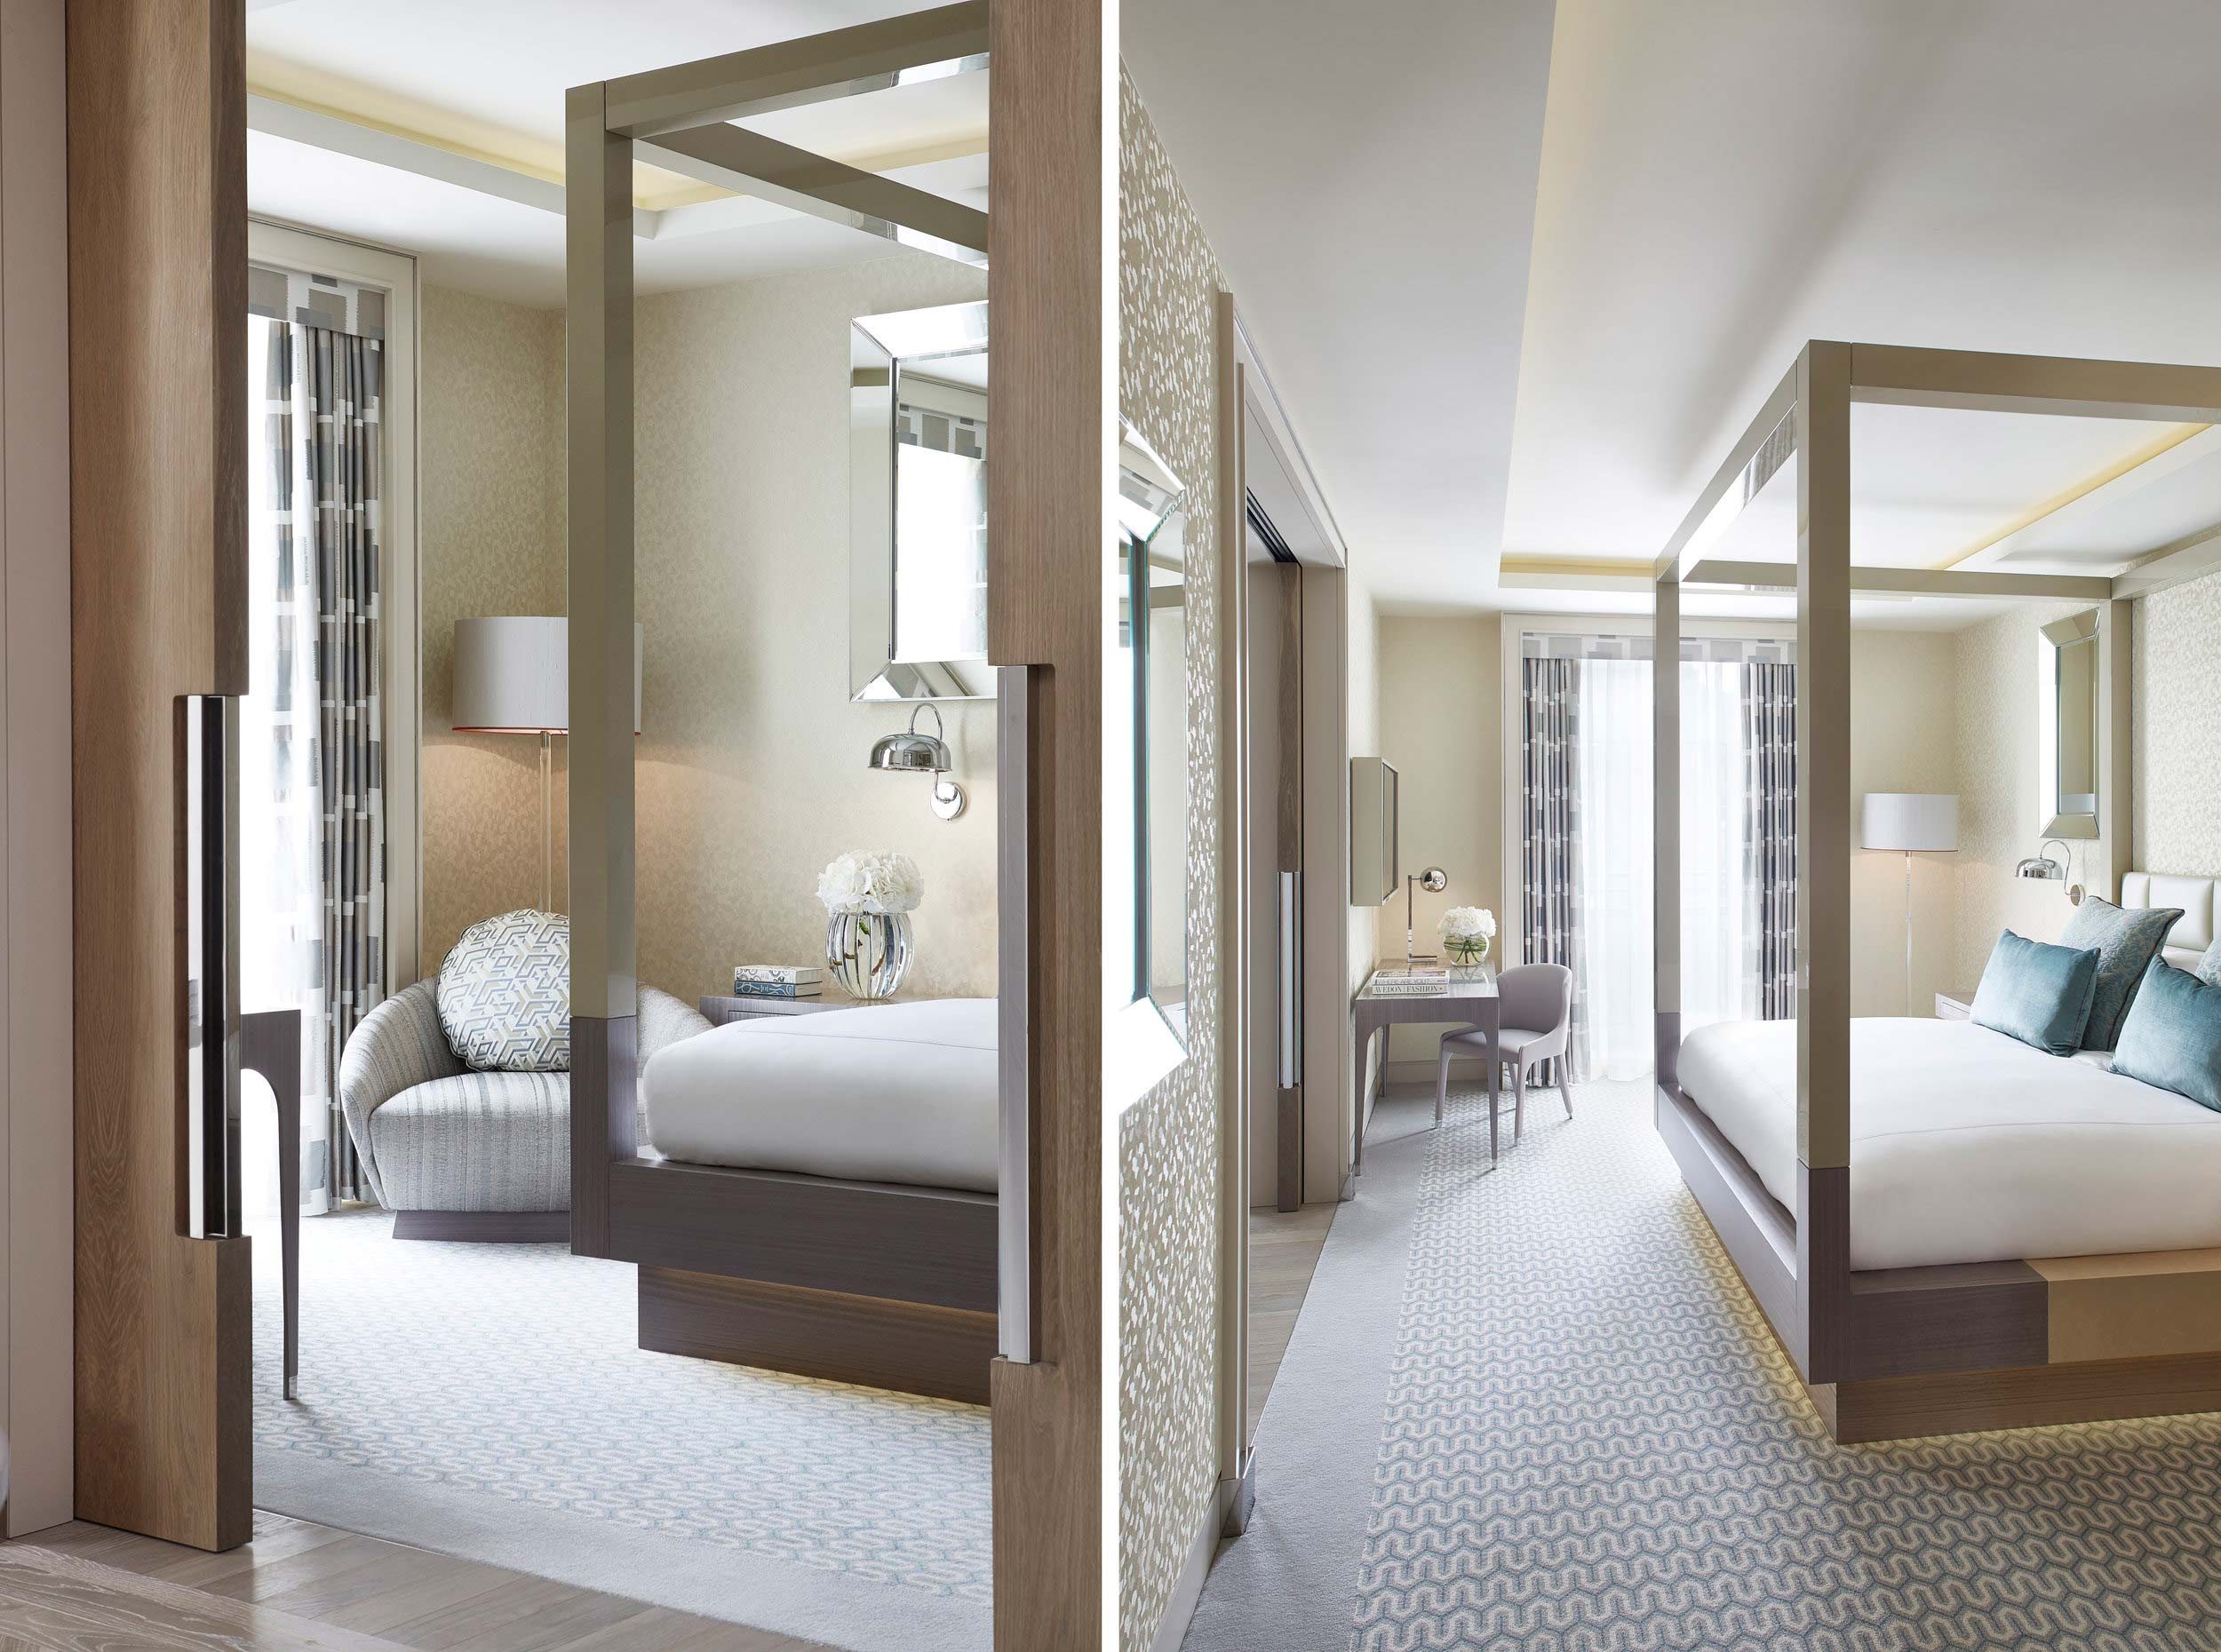 Room+221+Shot+2+020.jpg